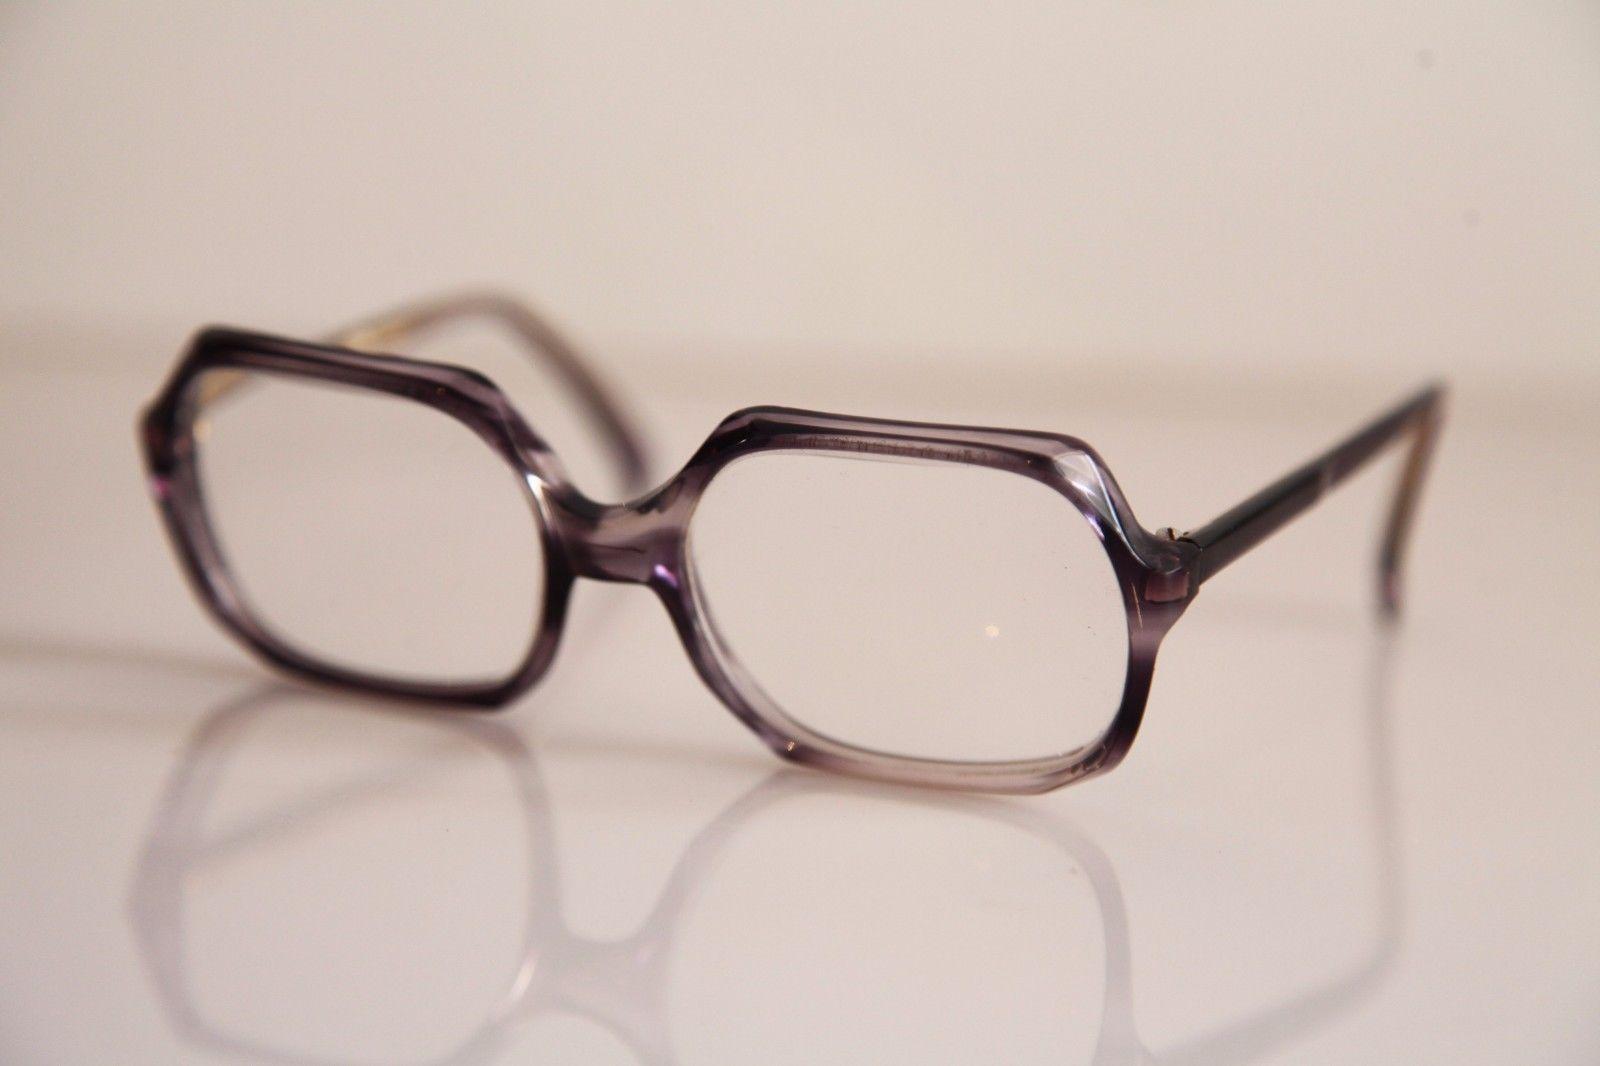 HARGA EVA Eyewear, Crystal Deep Purple Frame, RX-Able Prescription lens. FRANCE image 3